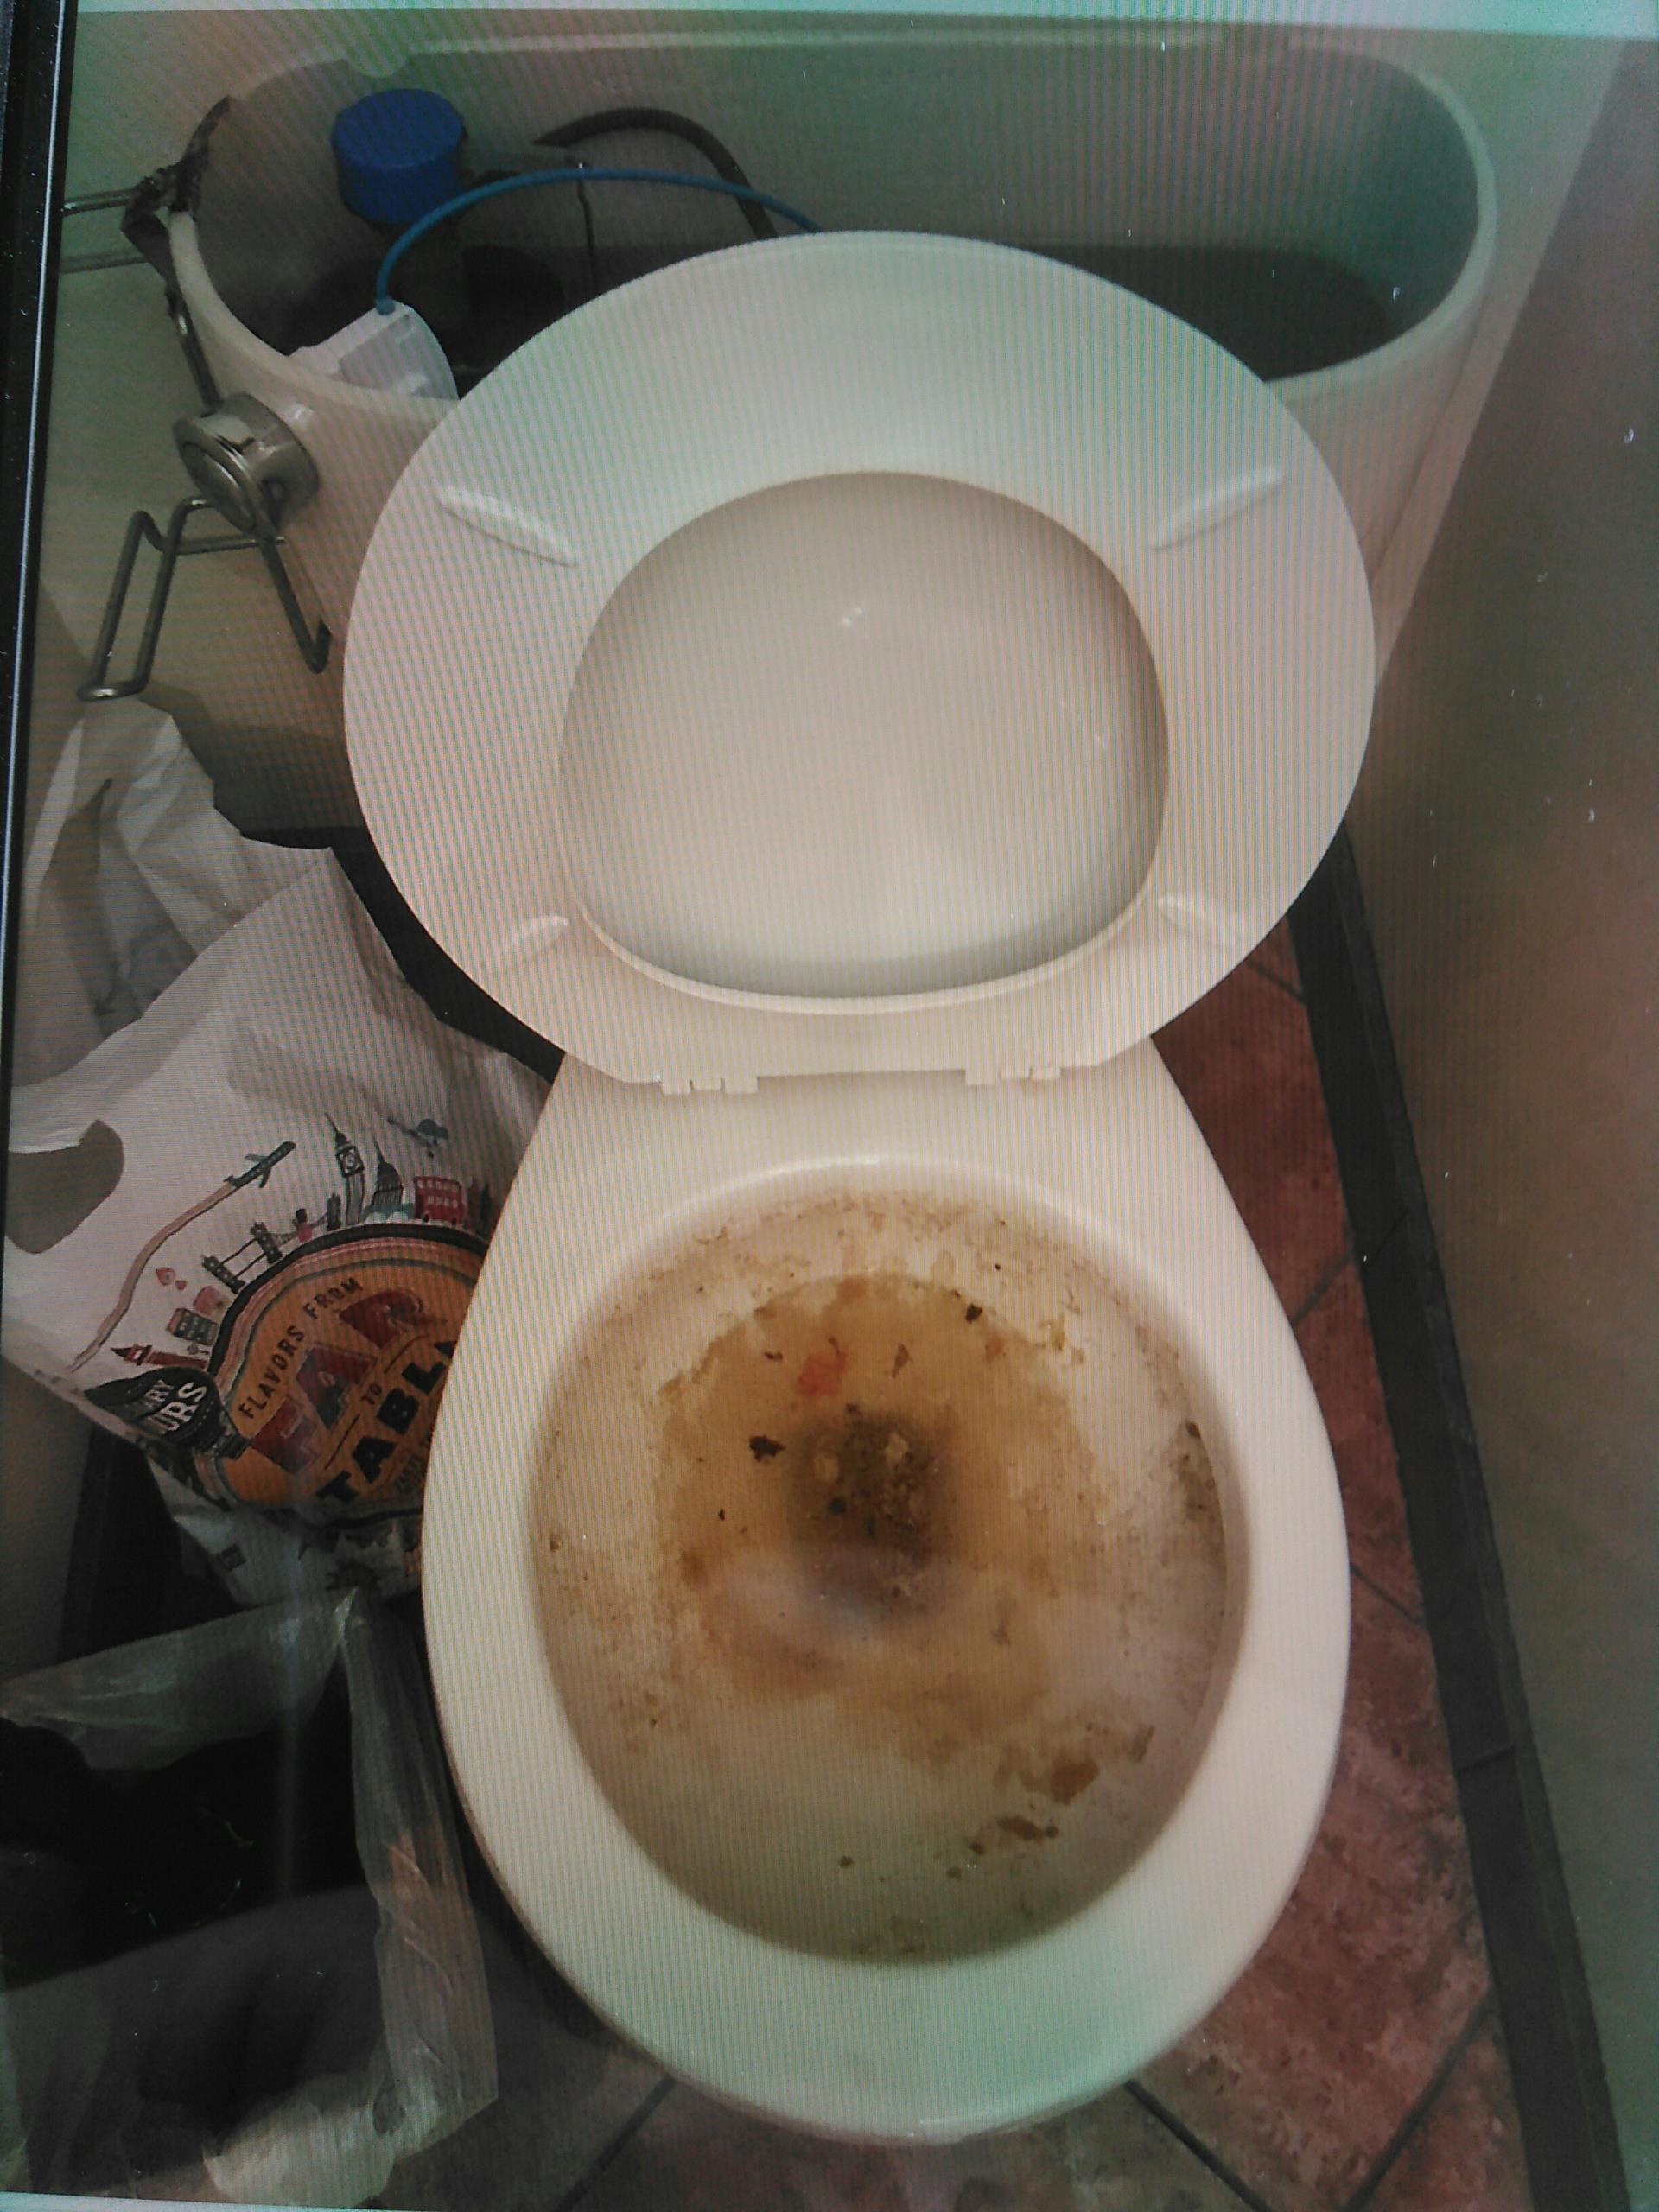 San Dimas, CA - Toilet stoppage